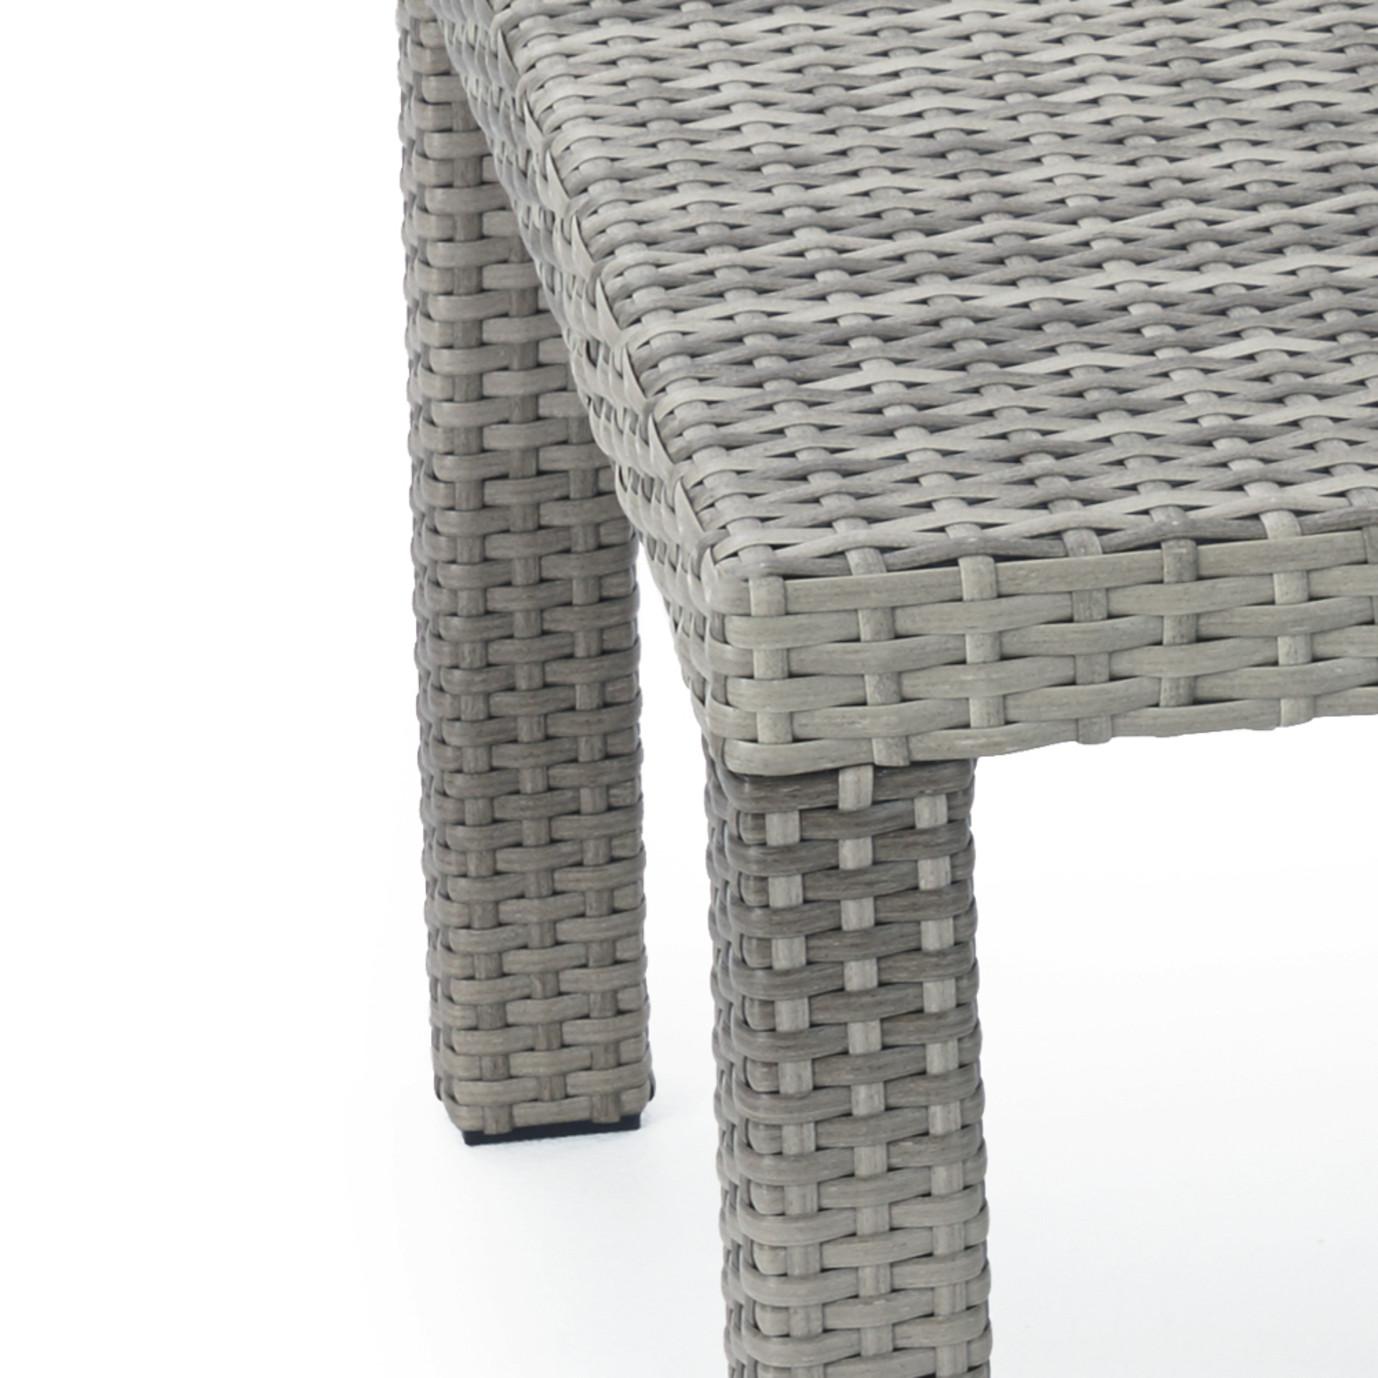 Cannes™ Sofa and Coffee Table - Slate Grey